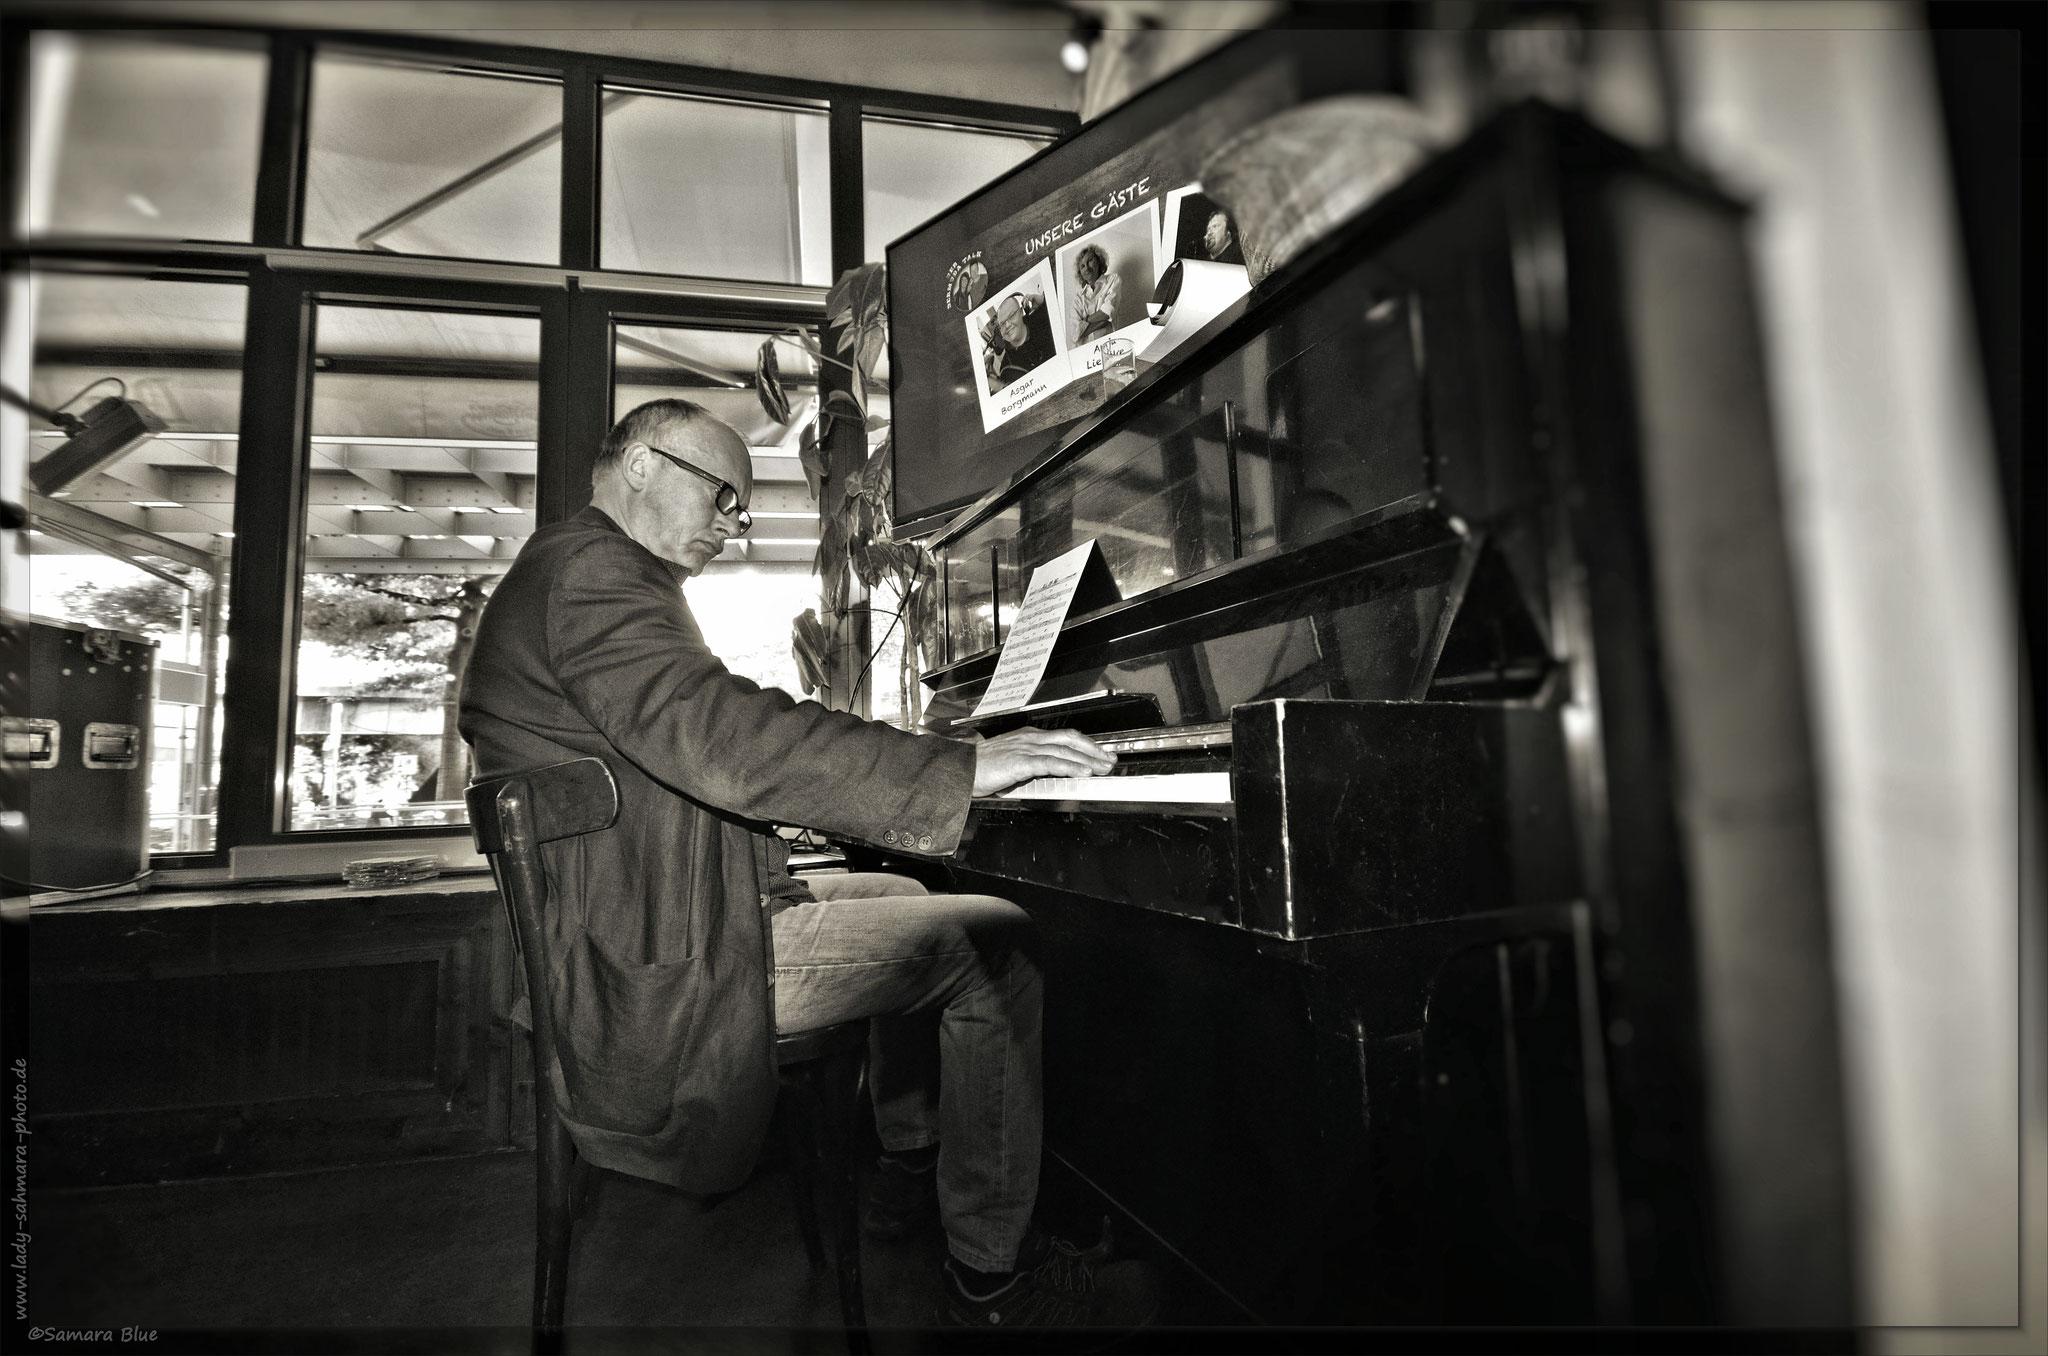 Der Mann am Klavier - Lady-Sahmara-Photo - Frank Hoelz - Das Consortium, Bochum